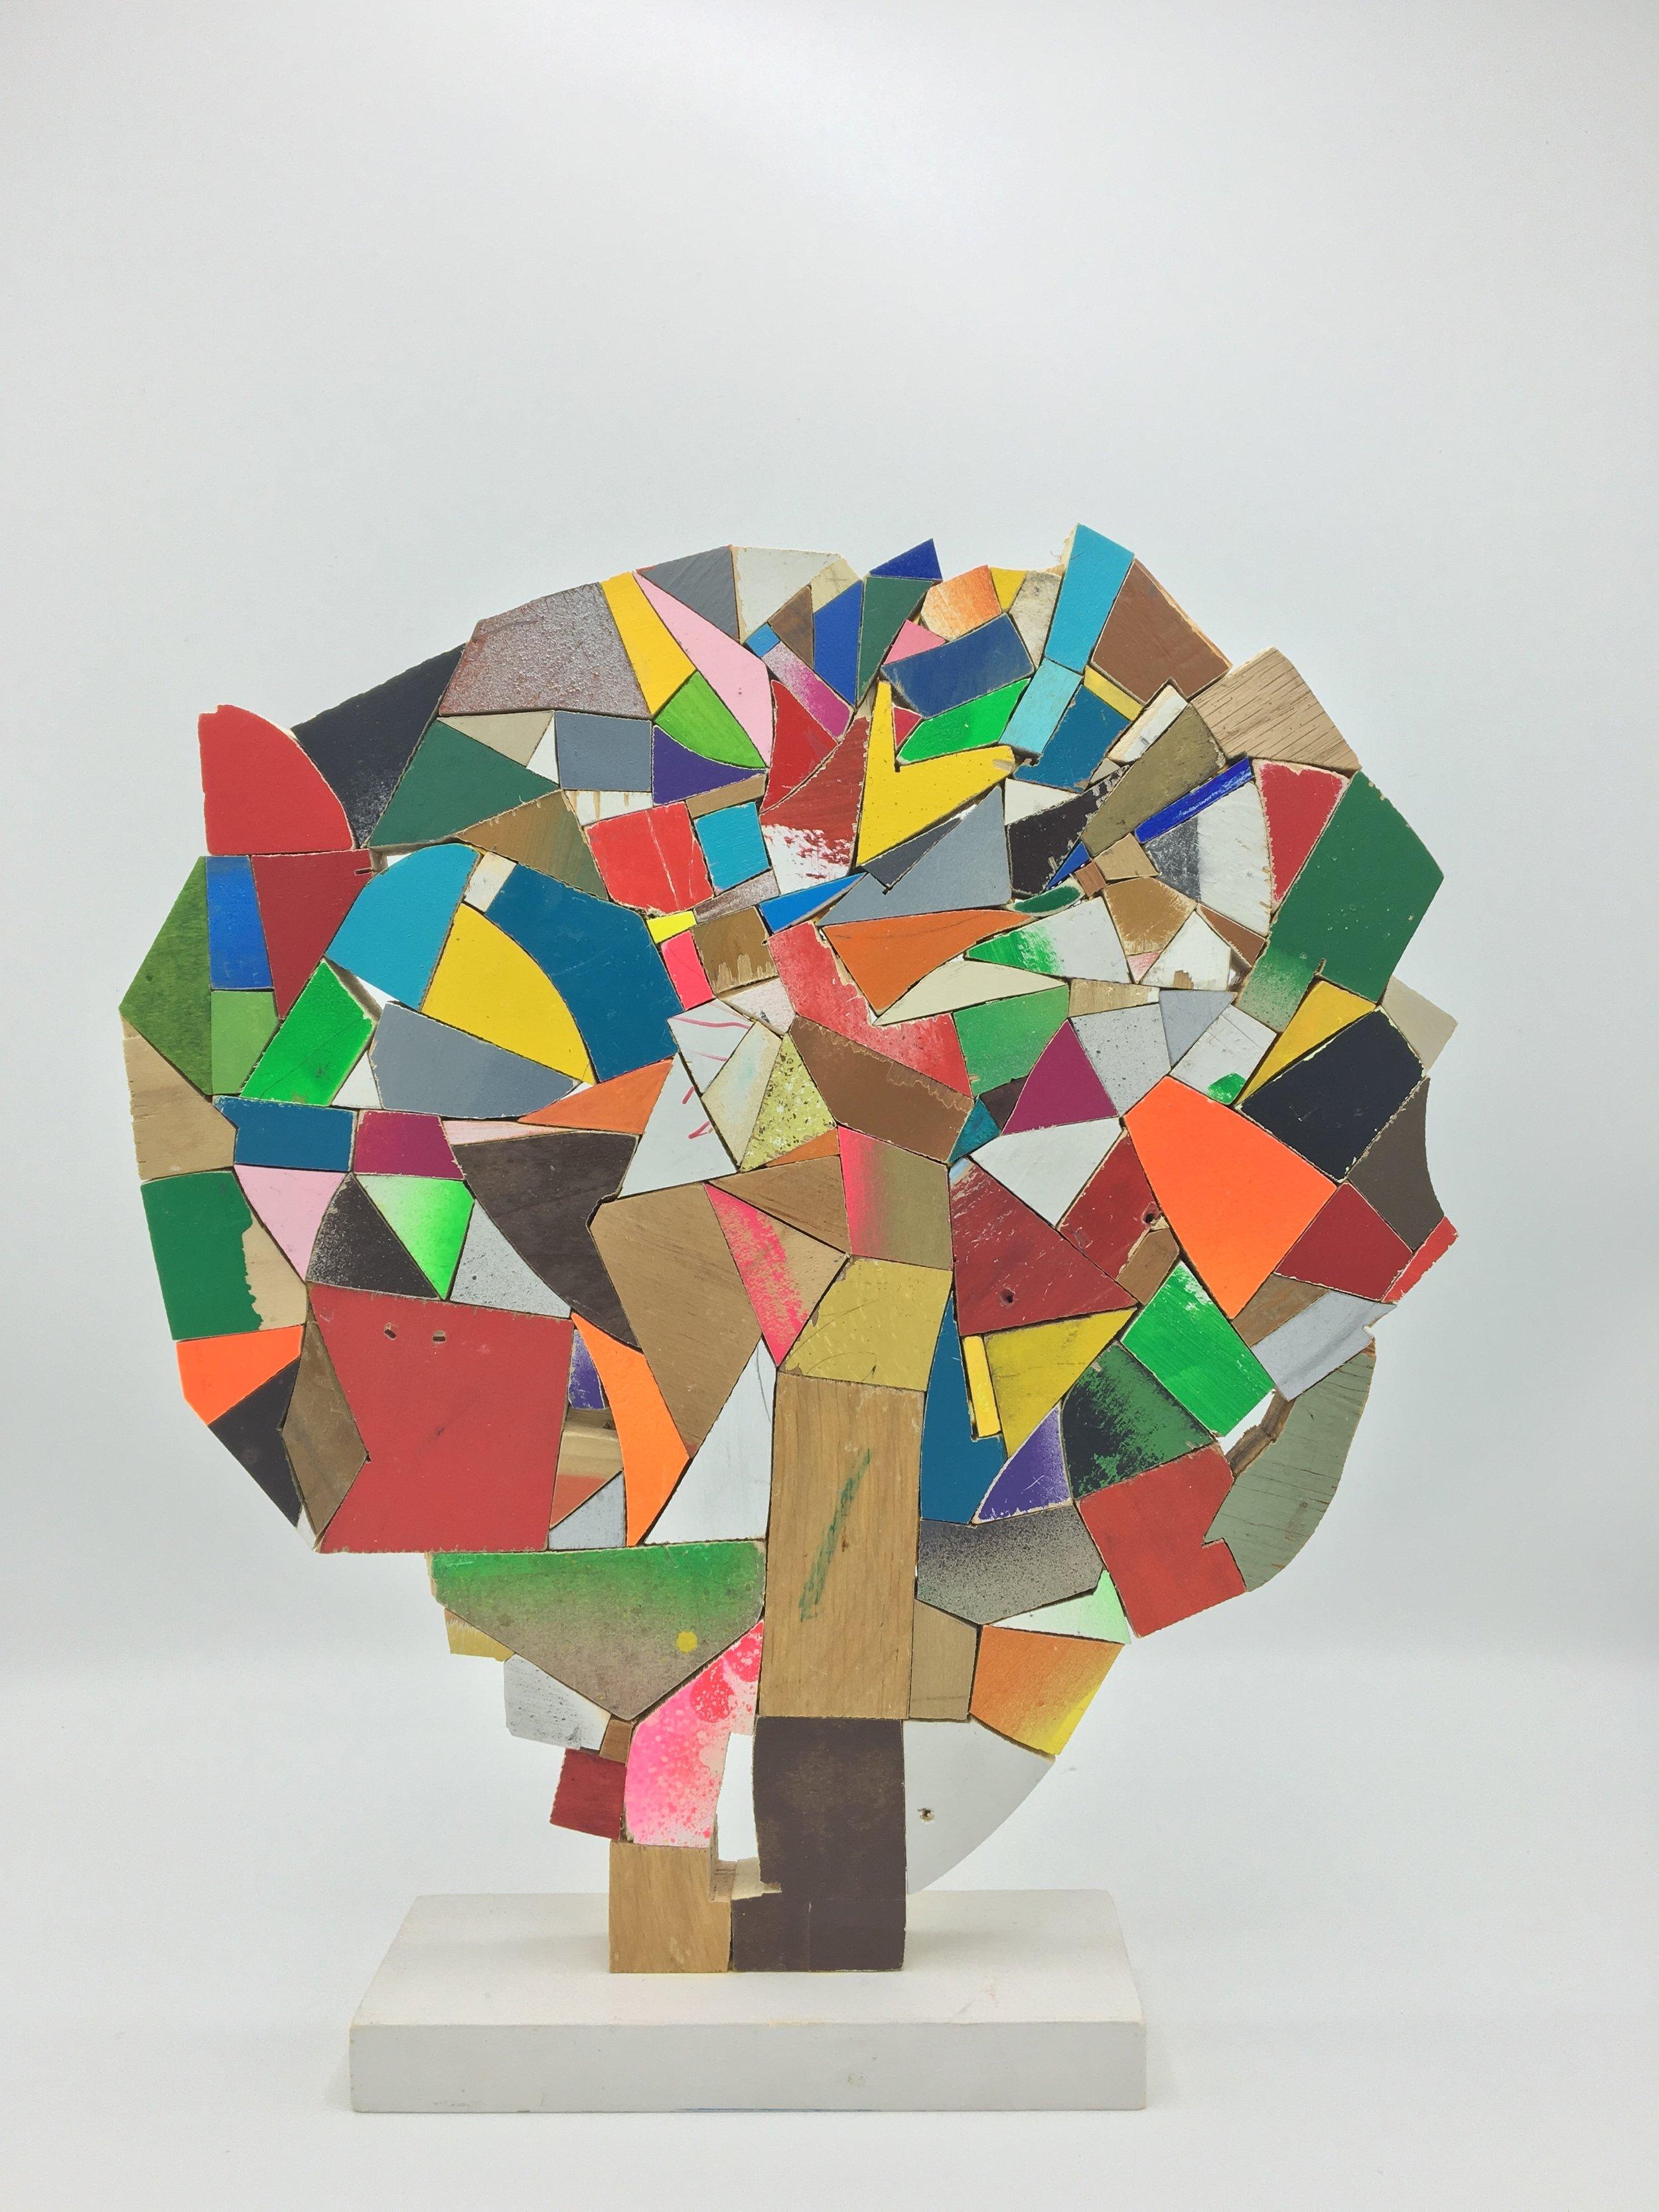 Damien Hoar de Galvan | Brain | 2016 | Wood, Paint, Colored Pencil, Glue | 13 x 11 x 2 in.